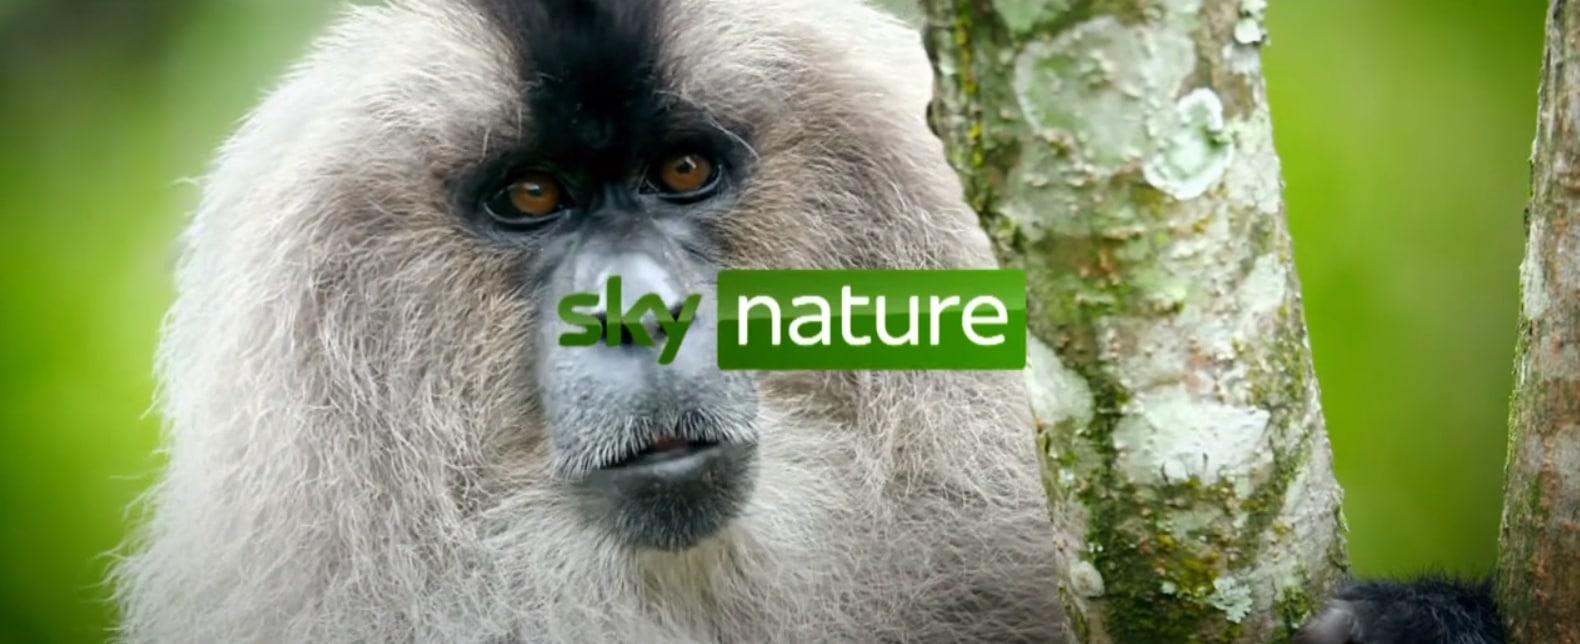 sky-nature-sender